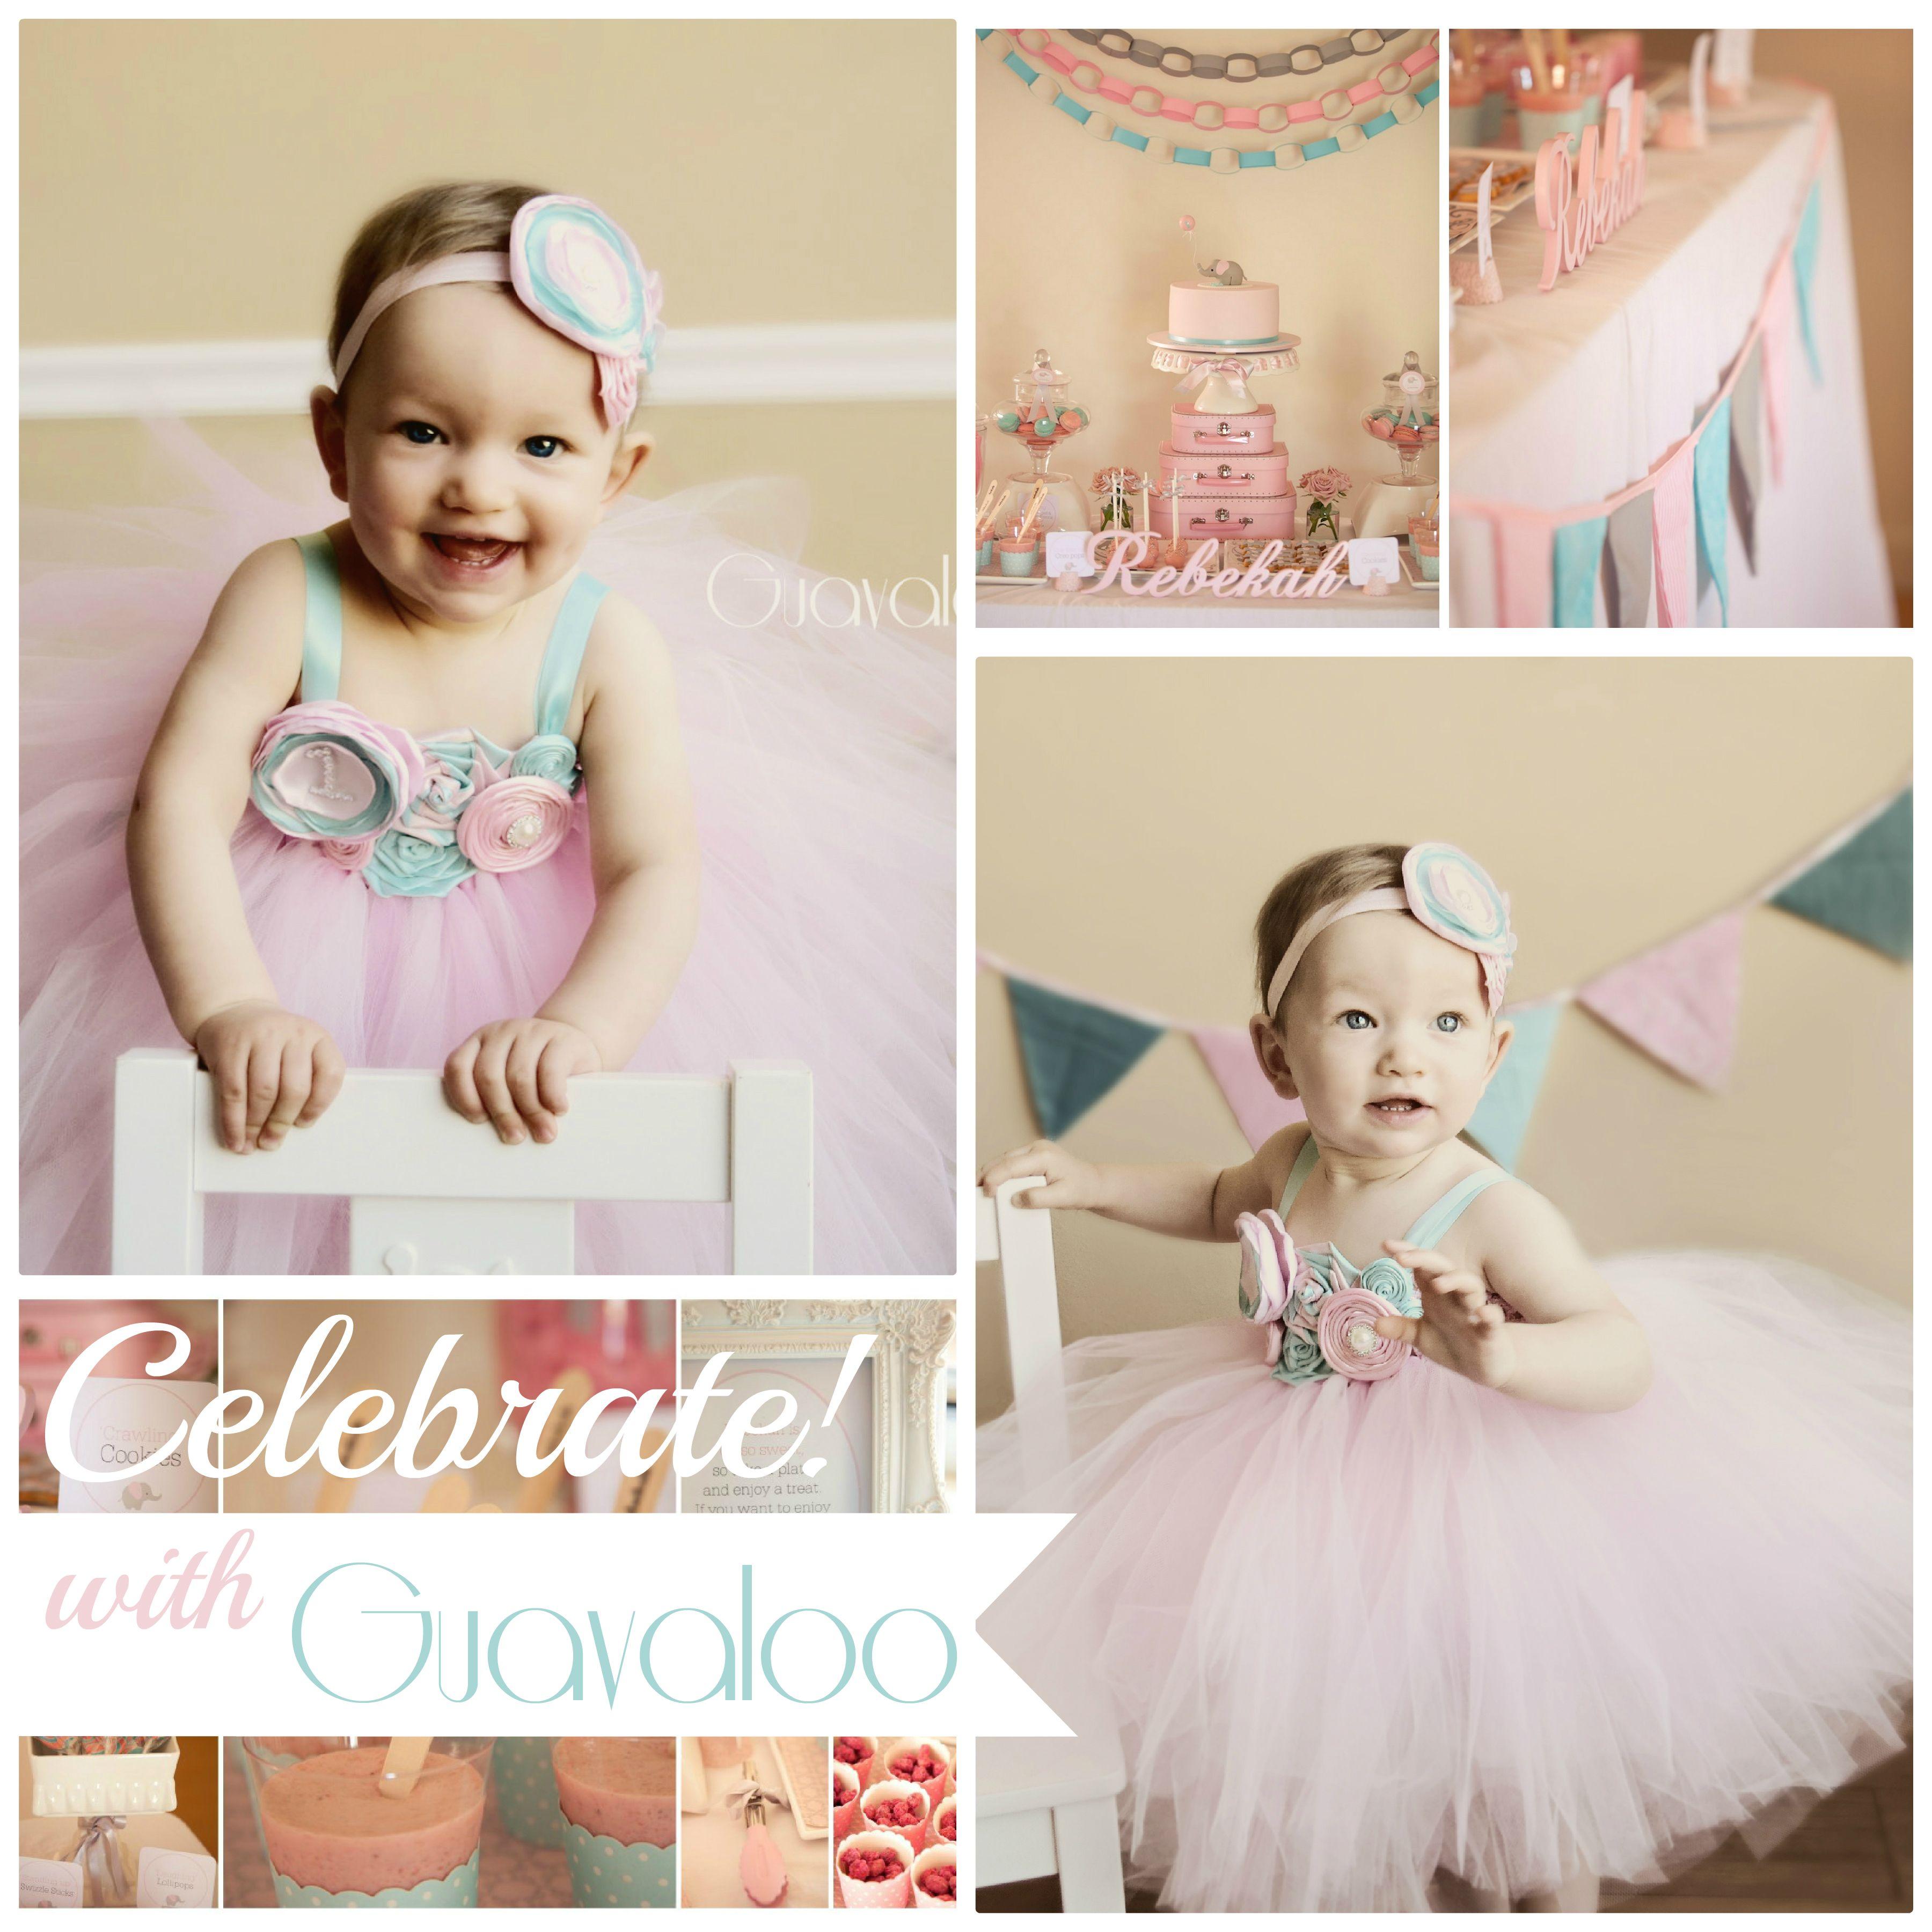 Pink Aqua Blue Tutu Dress First Birthday Party by Guavaloo My